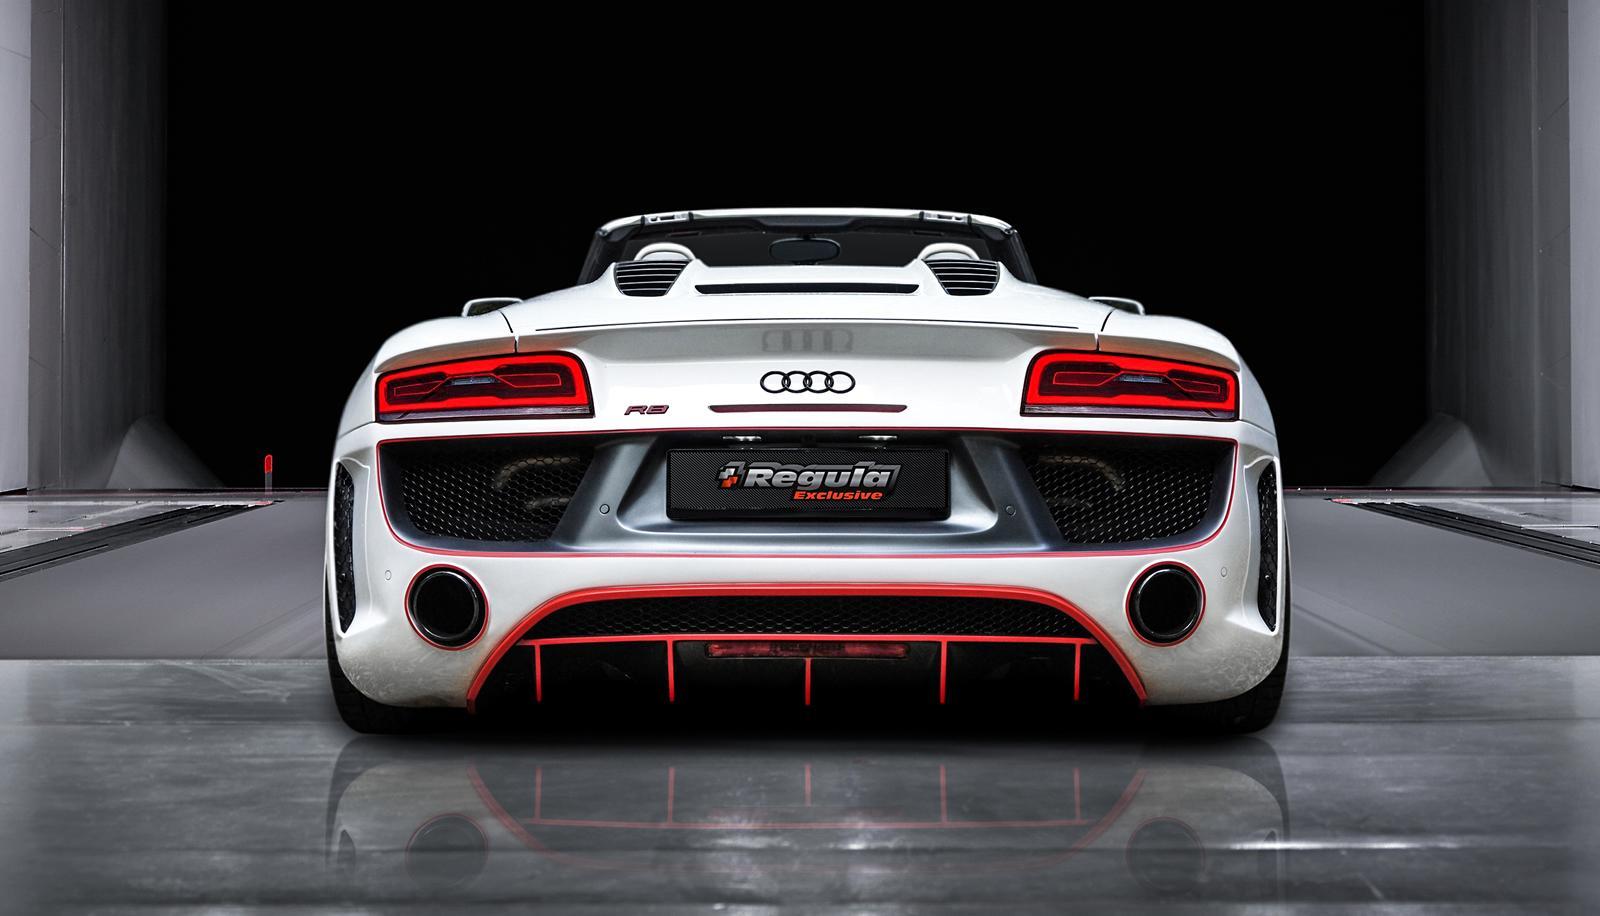 Berühmt Official: Audi R8 V10 Spyder by REGULA Tuning - GTspirit #HE_18